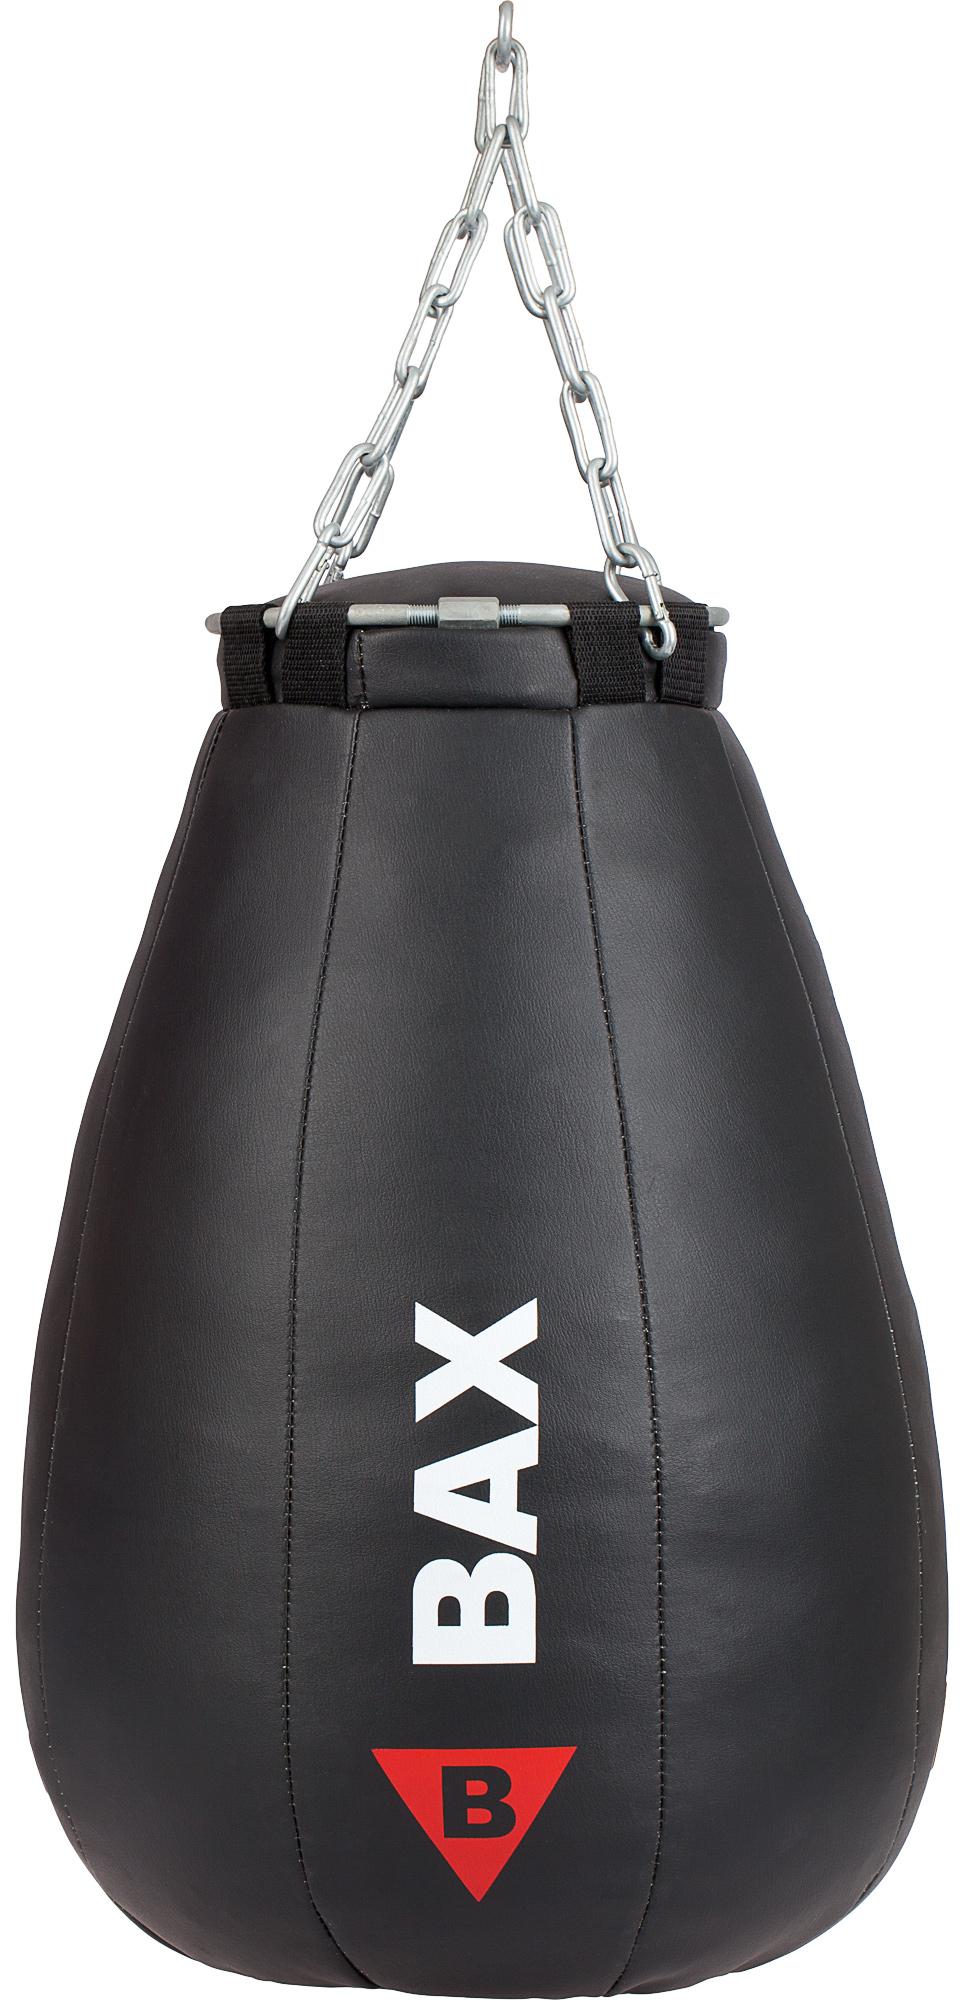 Bax Груша набивная Bax, 16 кг bax мешок набивной bax 40 кг